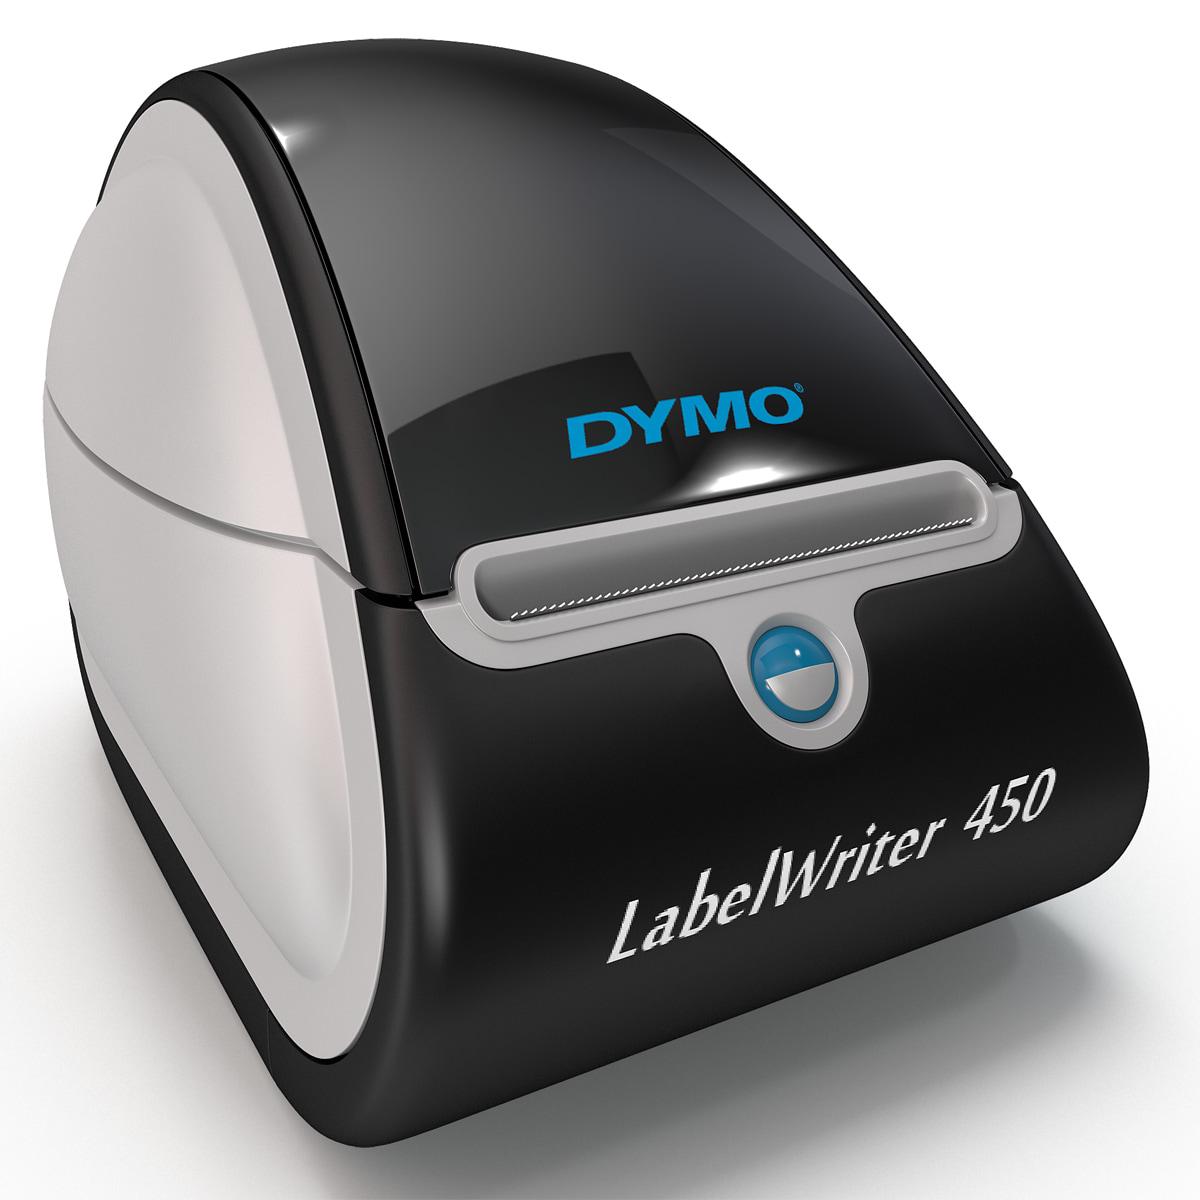 Postage and Label Printer DYMO LabelWriter 450_8.jpg